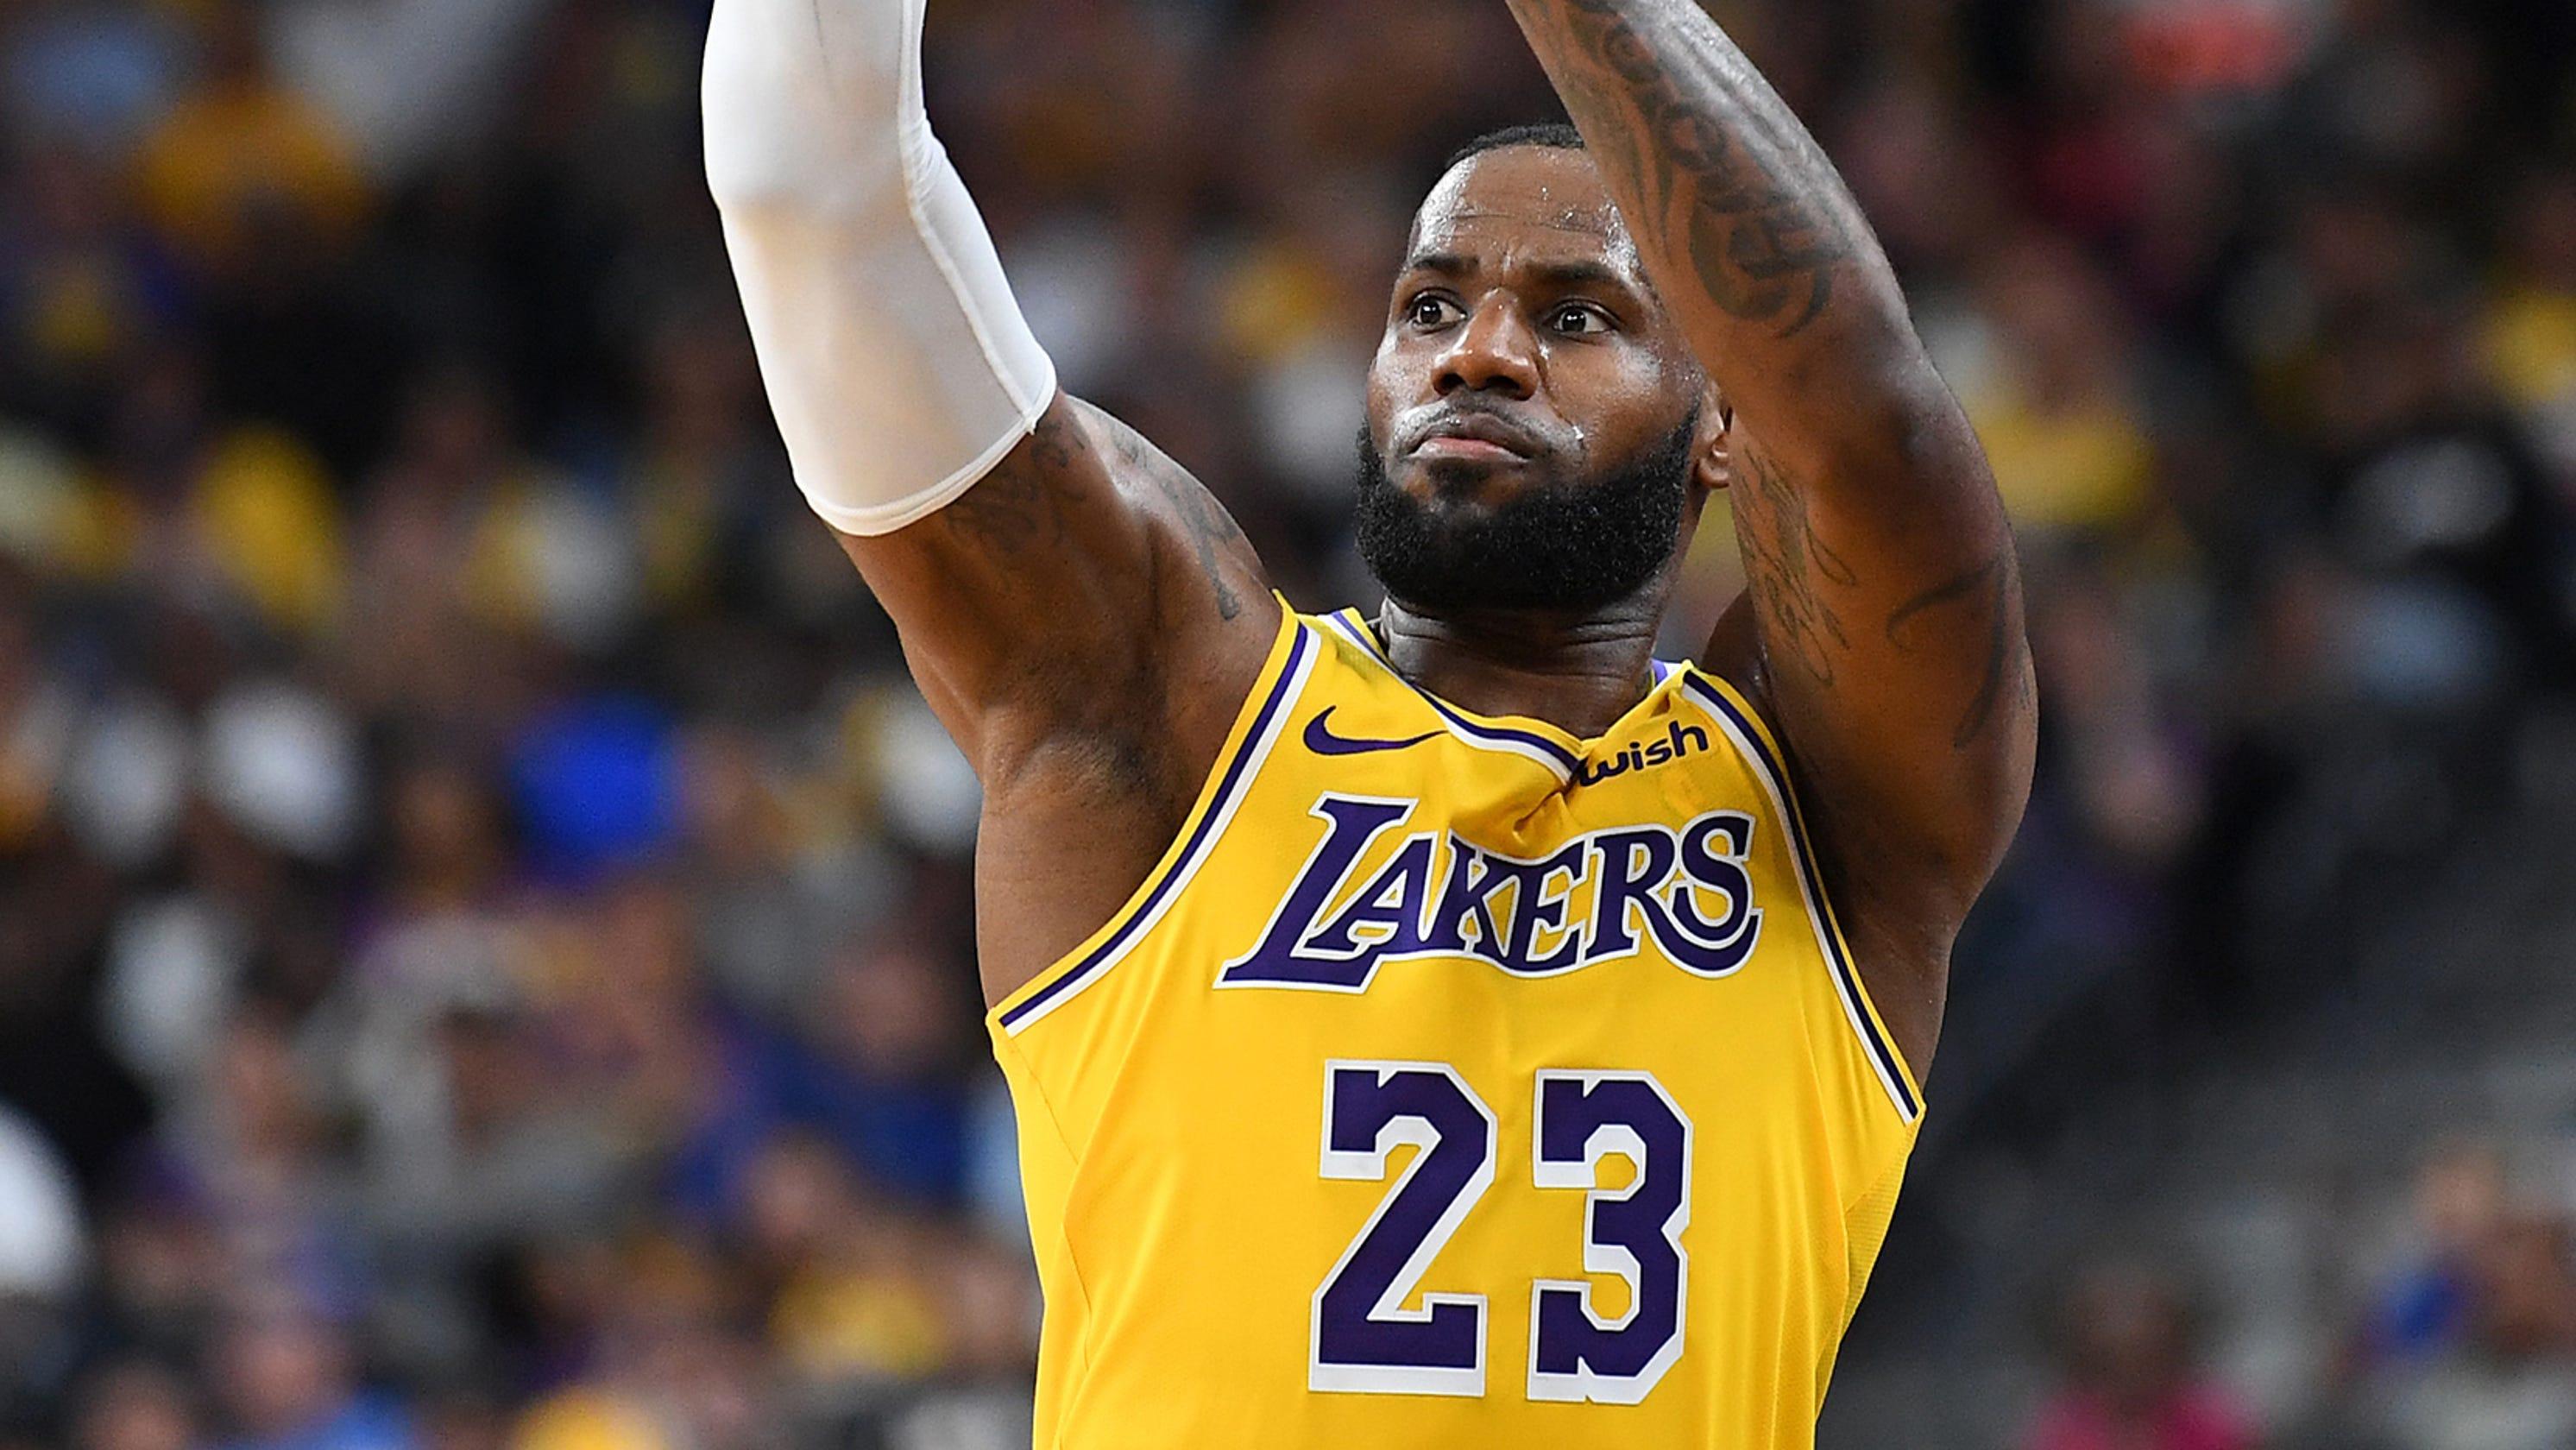 LeBron James  LA Lakers newcomer hits buzzer-beater three vs. Warriors e97bca5f1